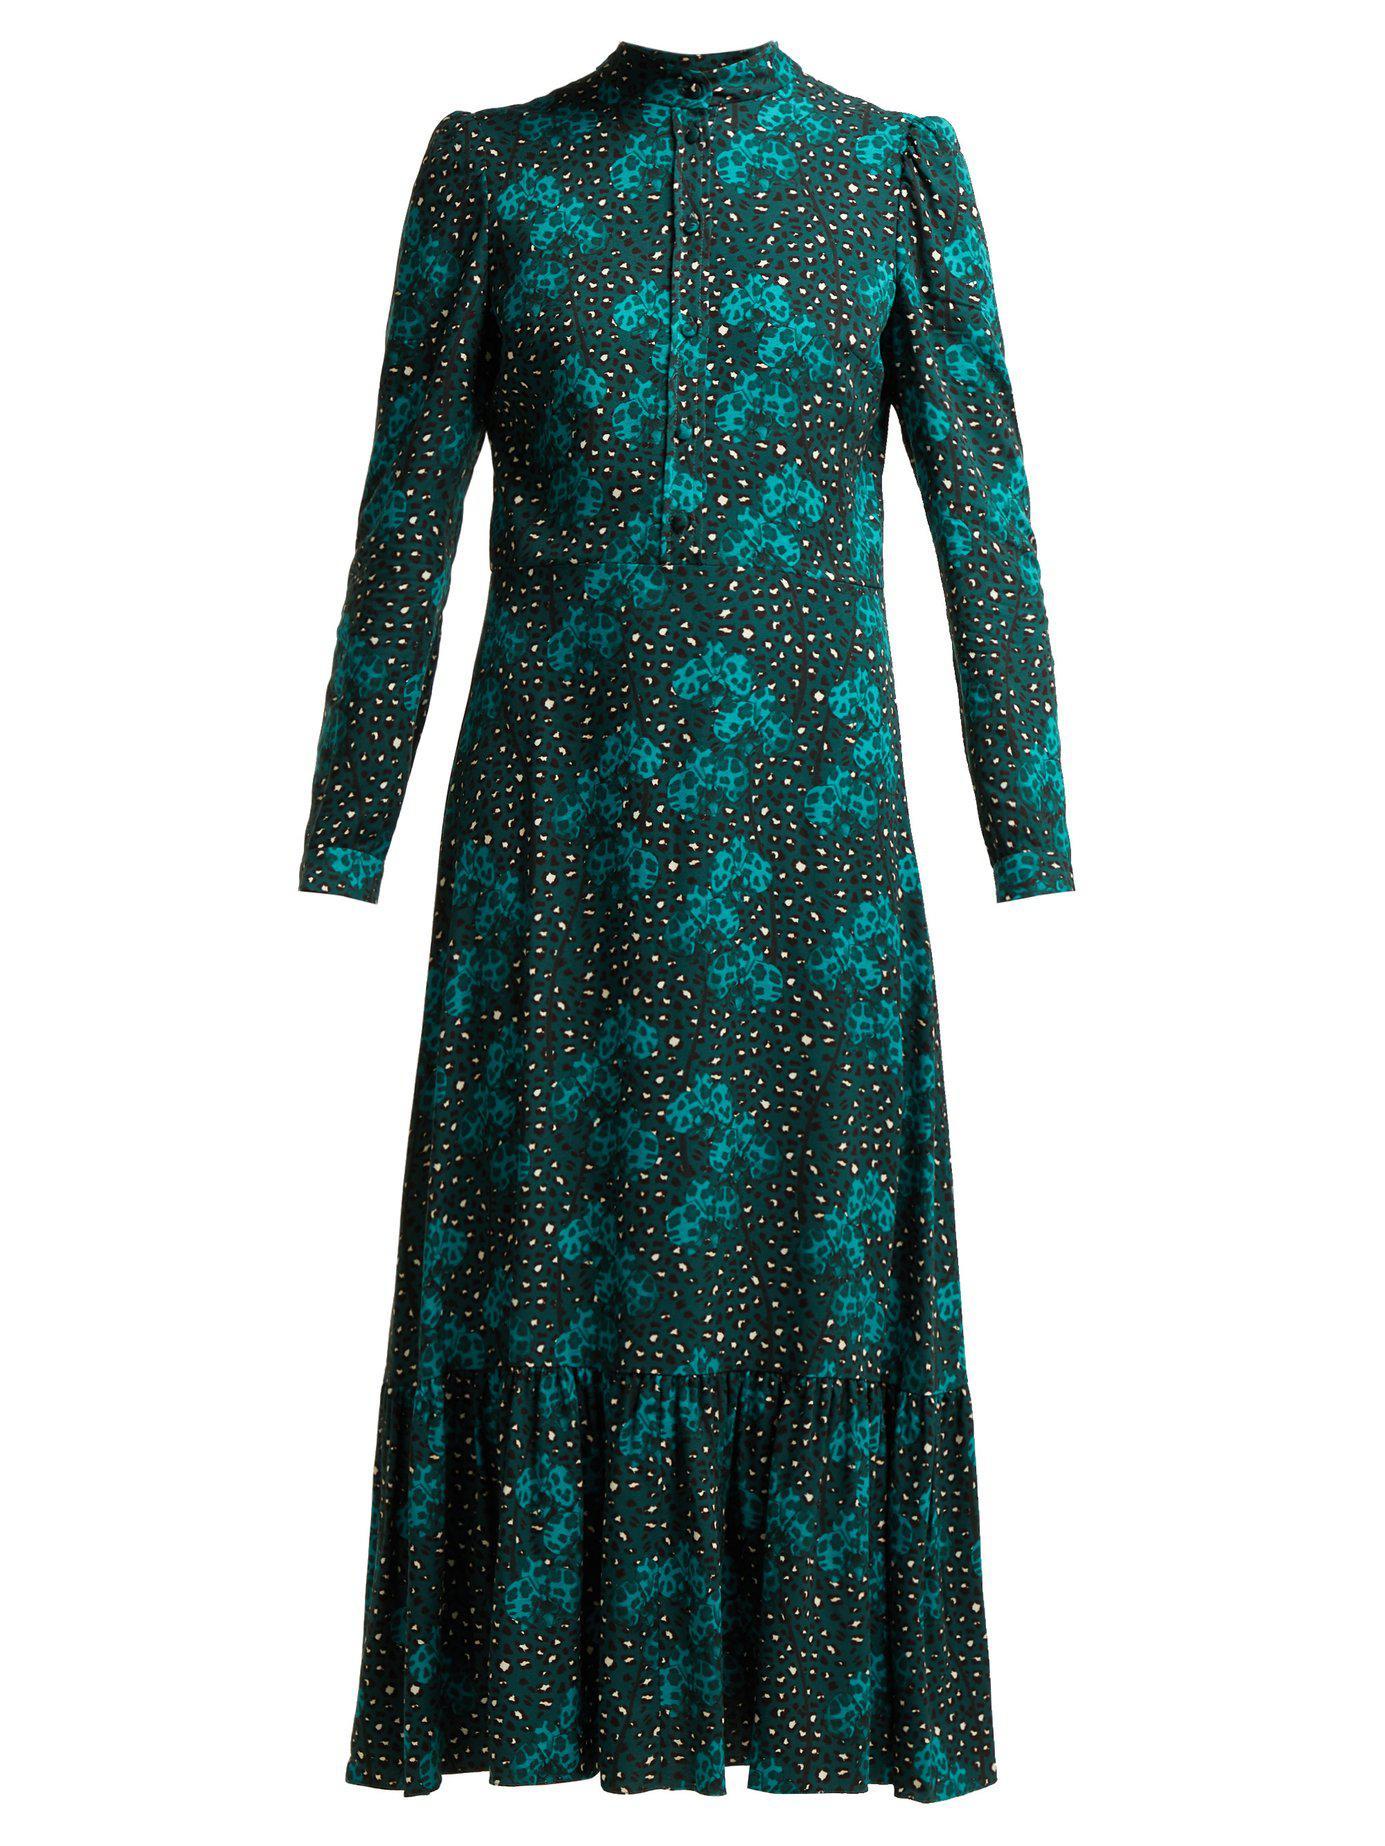 3ba3e19394 Borgo De Nor. Women s Green Rafaela Orchid And Leopard Print Crepe Midi  Dress